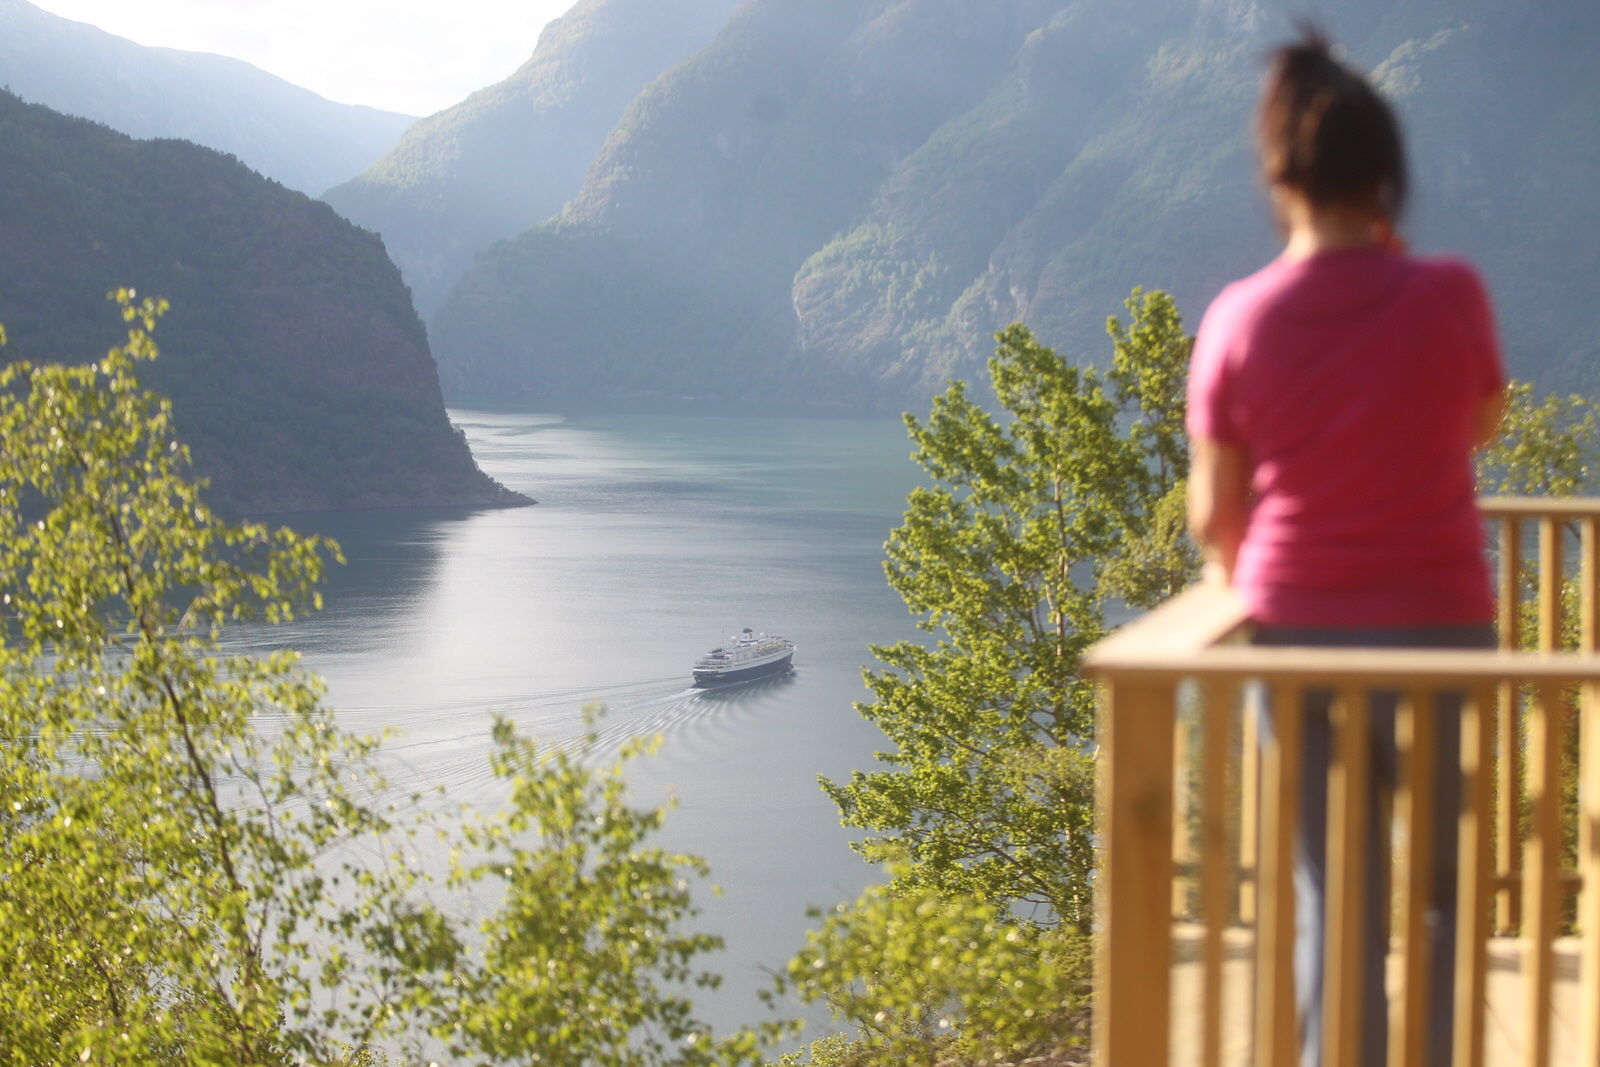 Vinjaåsen i Aurland, utsikt over Aurlandsfjorden. Foto: Stig Roger Eide